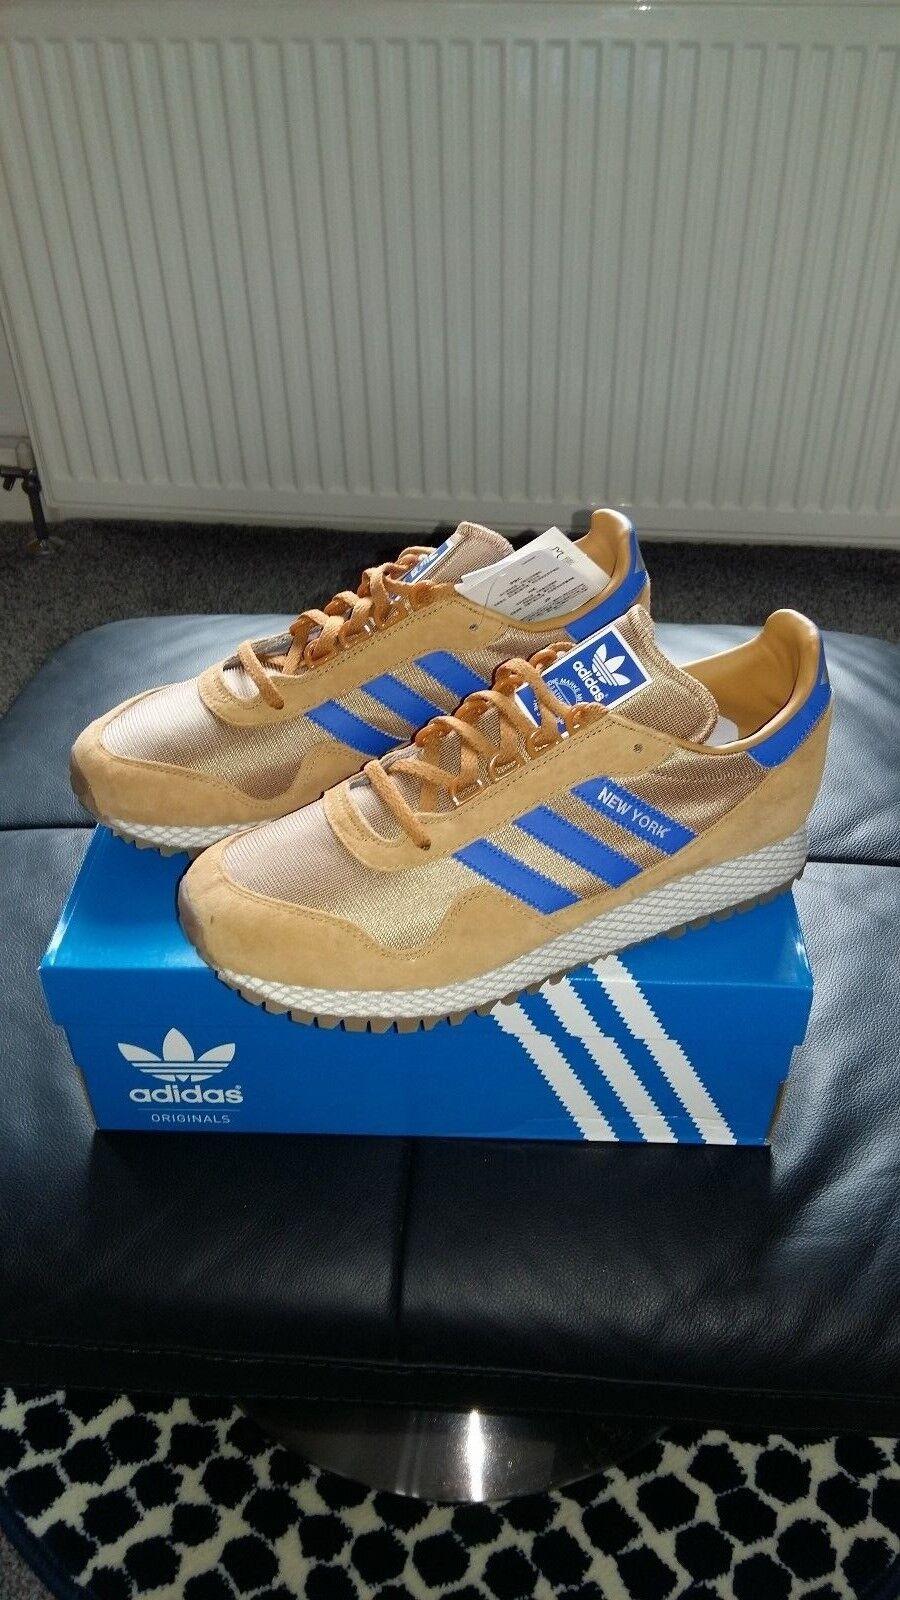 Adidas   New york   Originals.. old skool  trainers size 7 uk eur 40 2 3